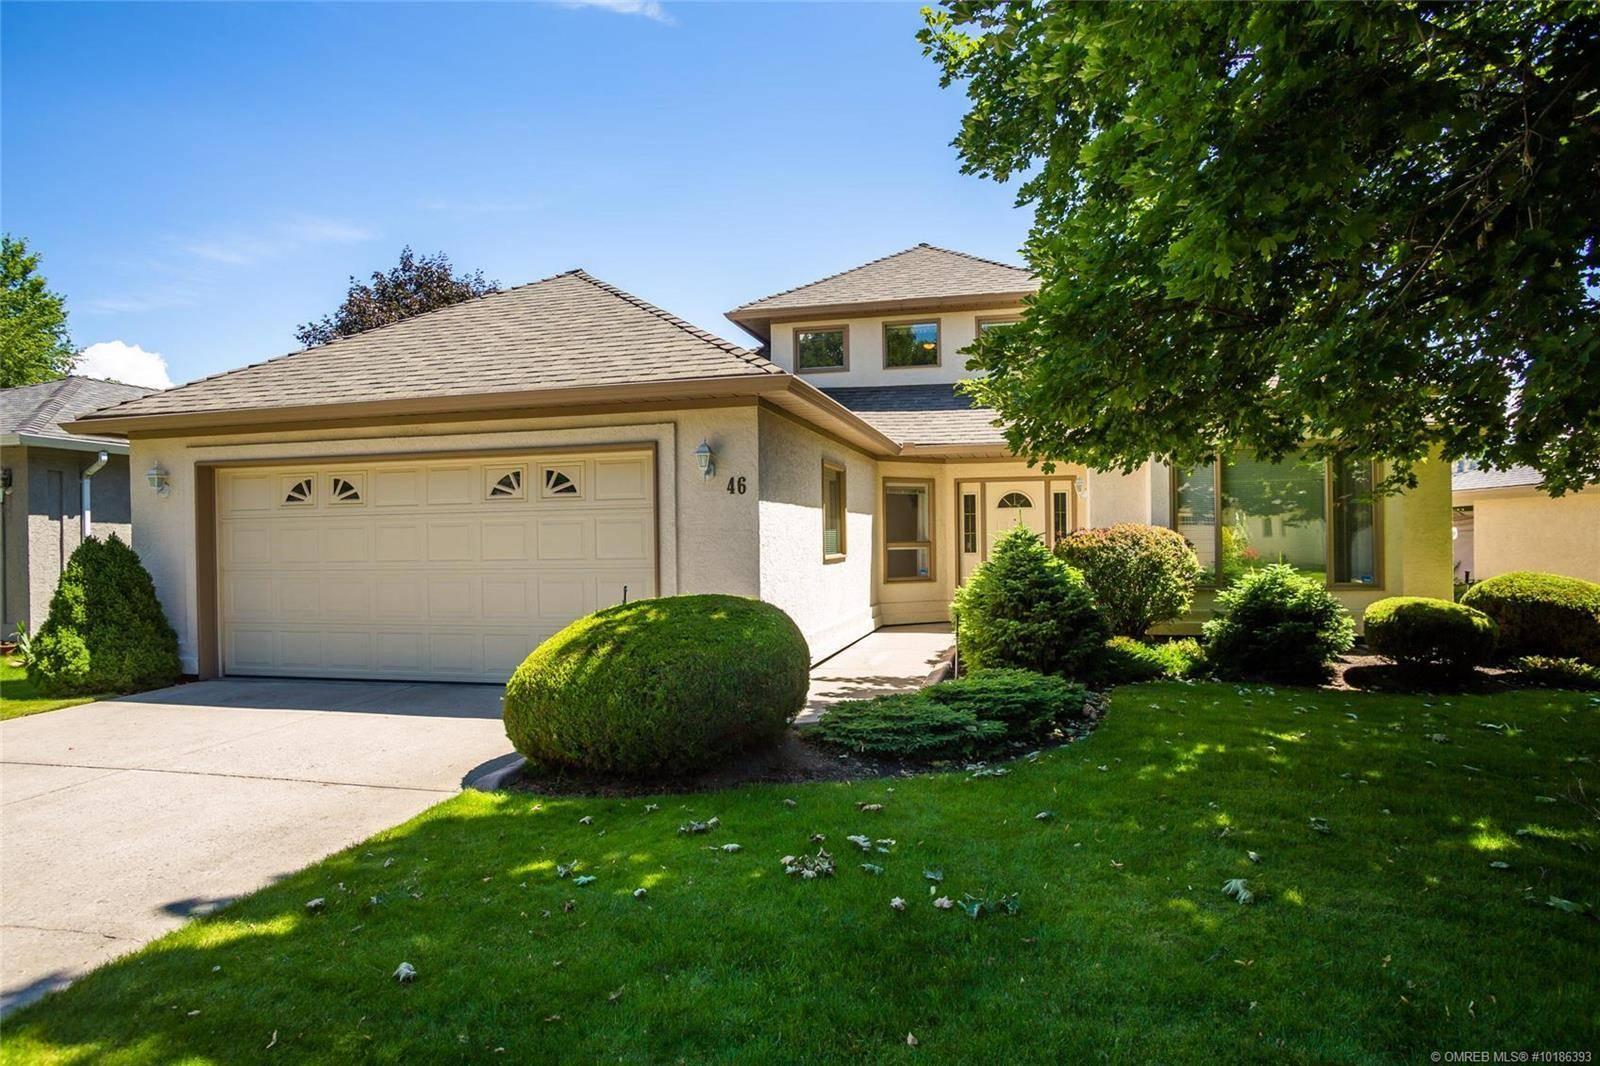 House for sale at 615 Glenmeadows Rd Unit 46 Kelowna British Columbia - MLS: 10186393